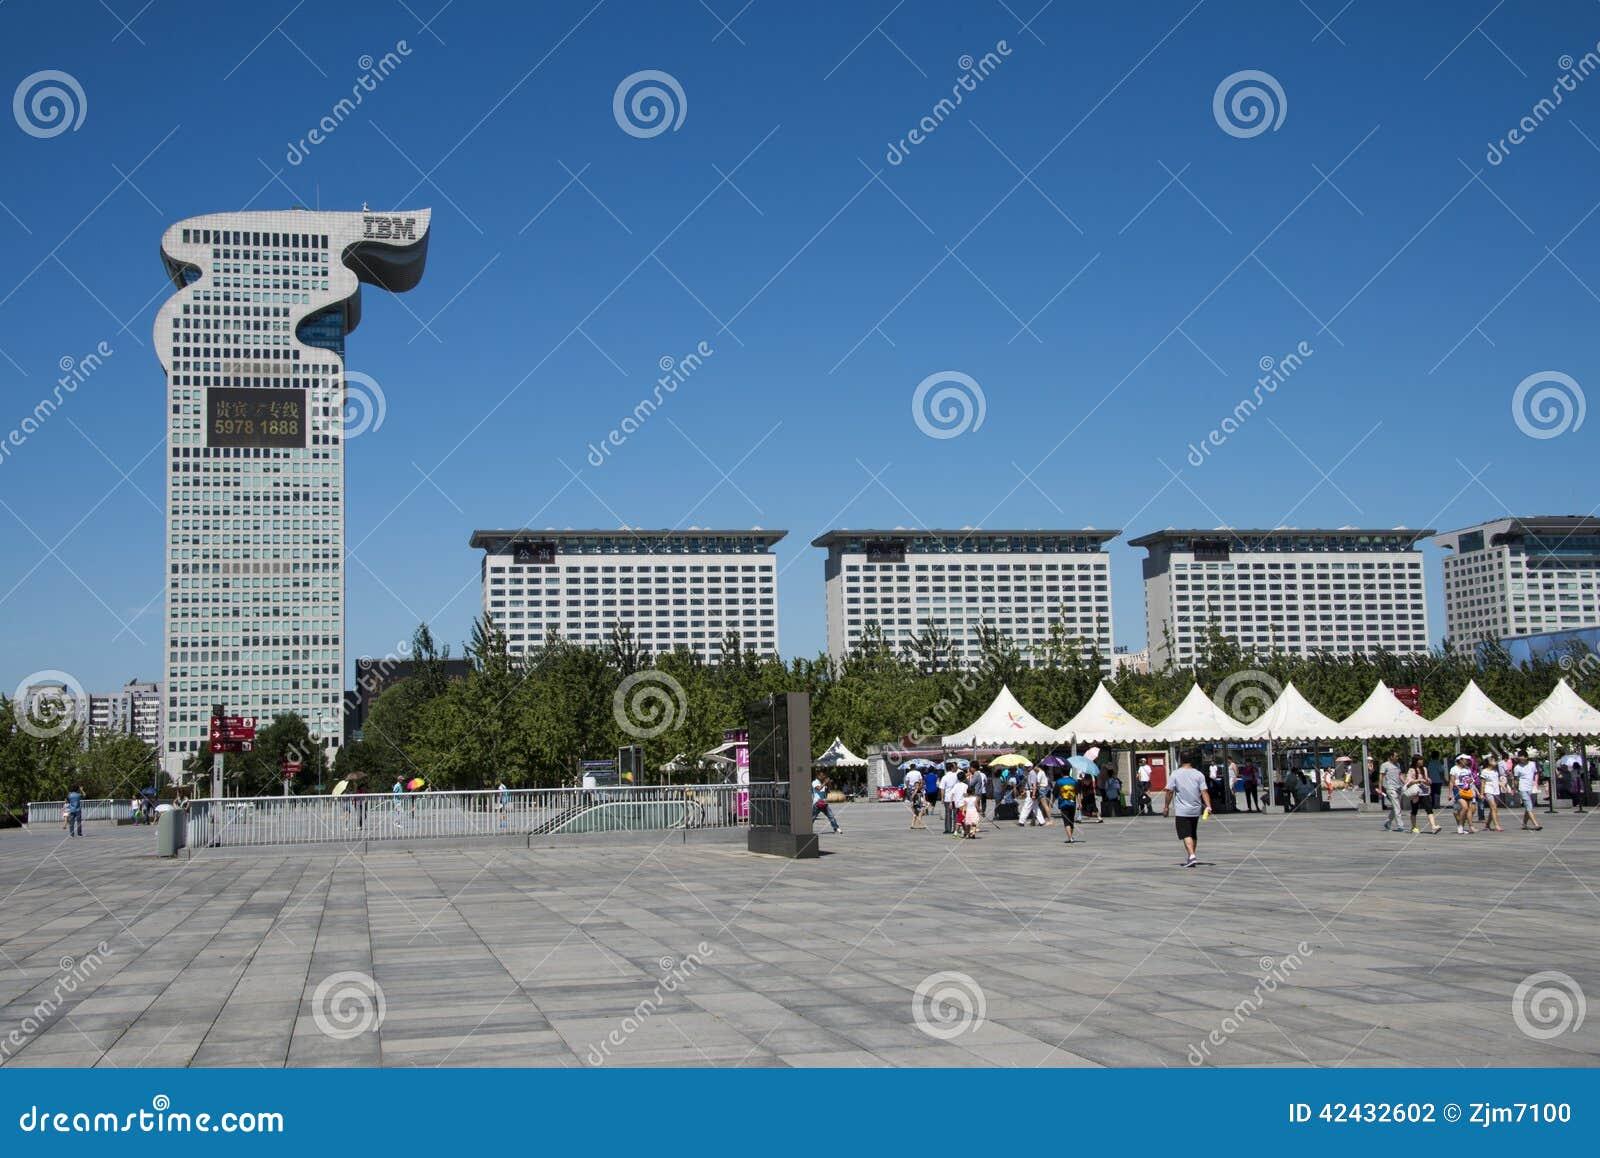 Chino asiático, Pekín, arquitectura moderna, plaza de Pangu,